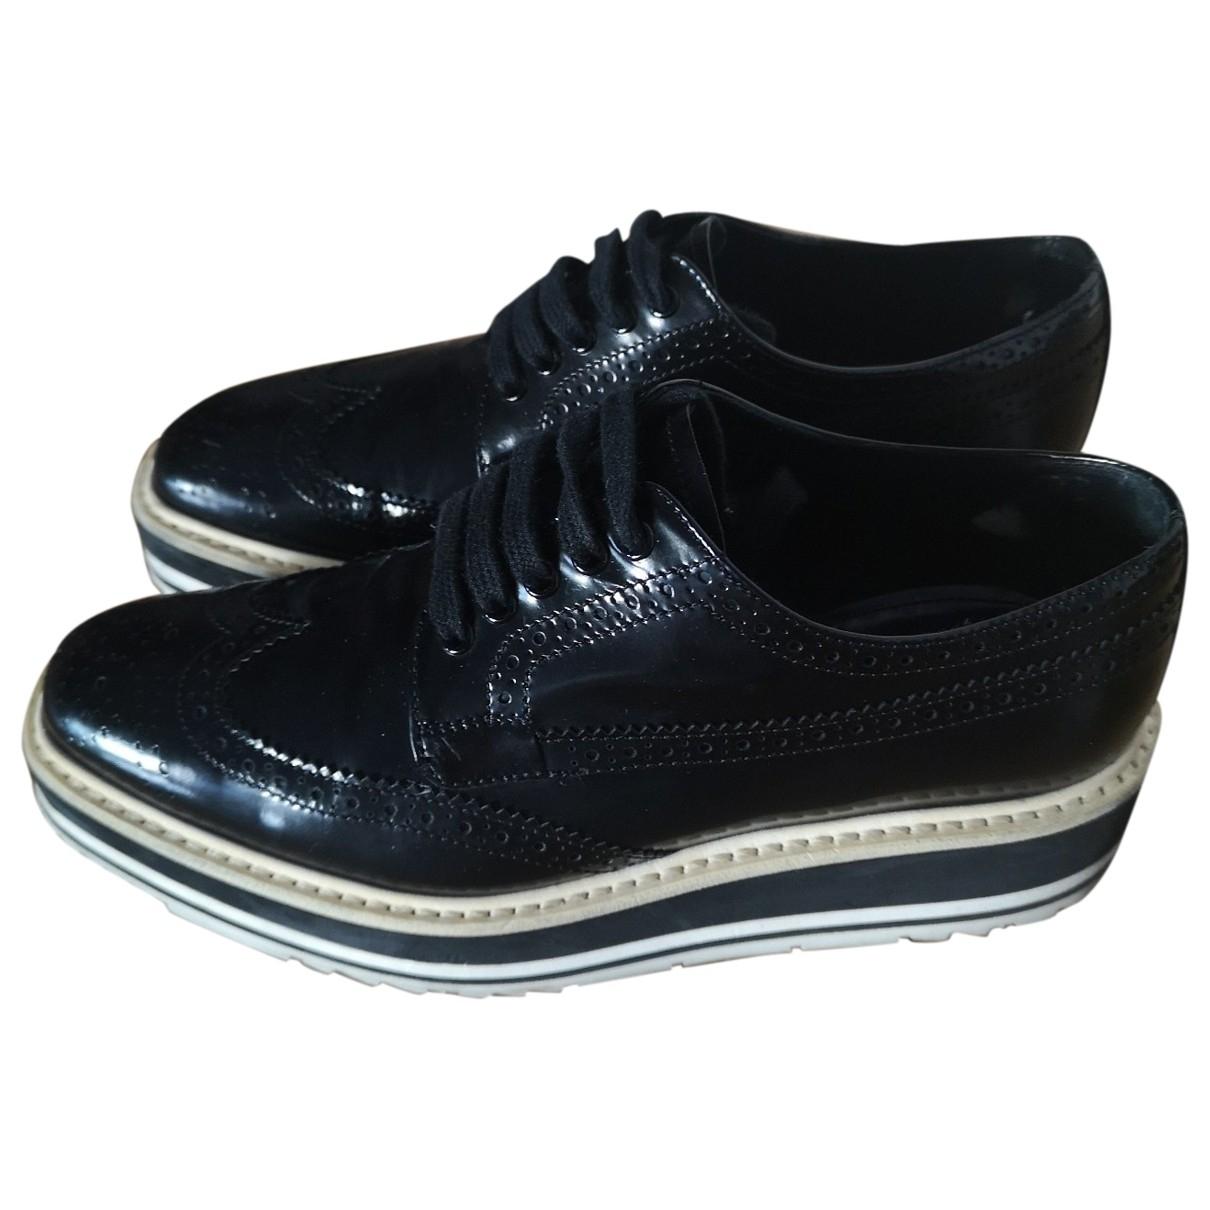 Prada \N Black Leather Lace ups for Women 35 EU